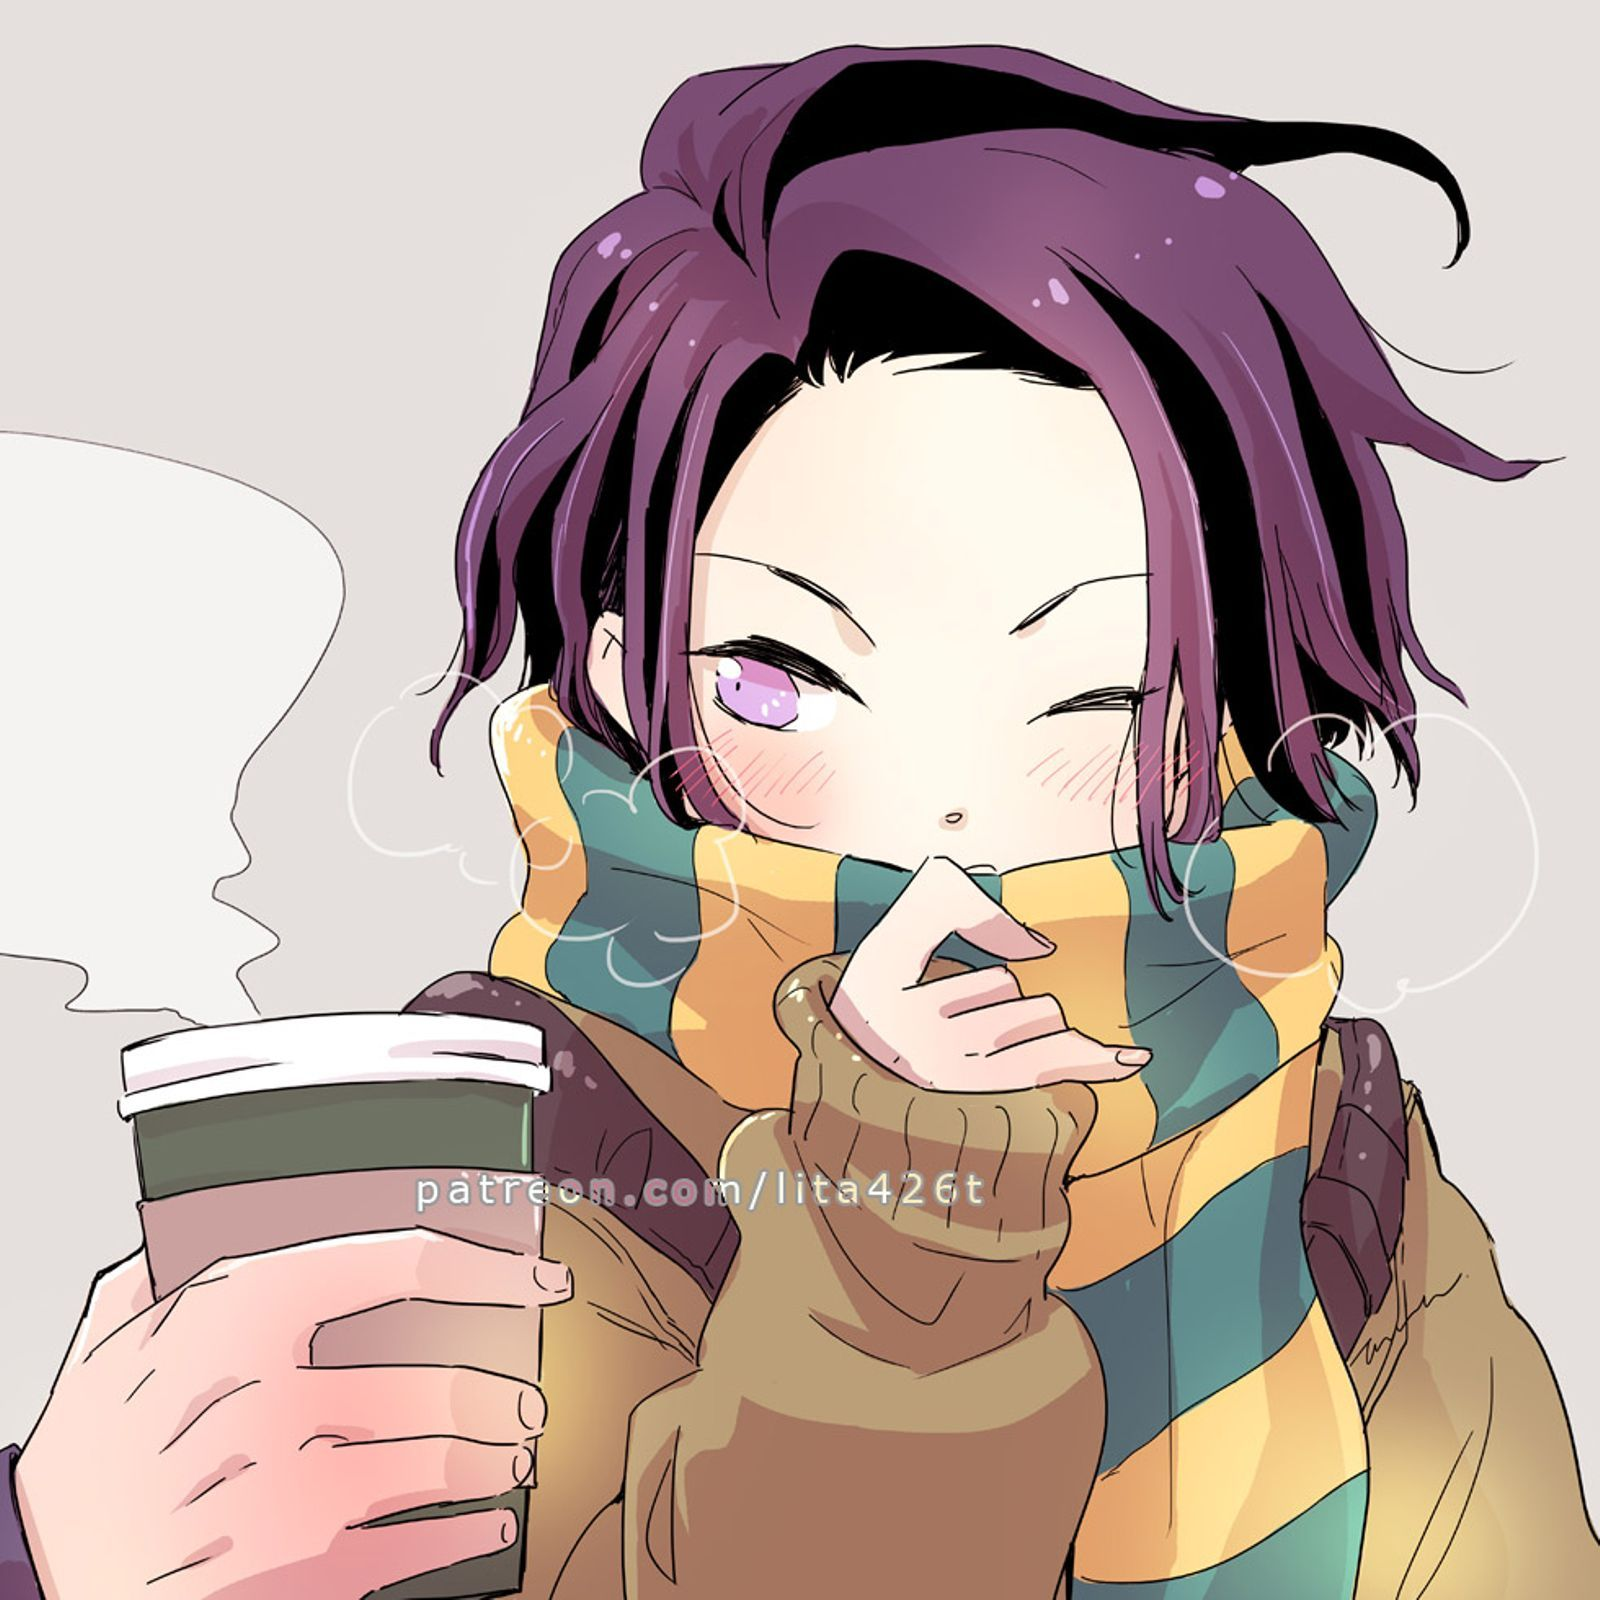 20171206 hot drink | Tachibana Lita on Patreon